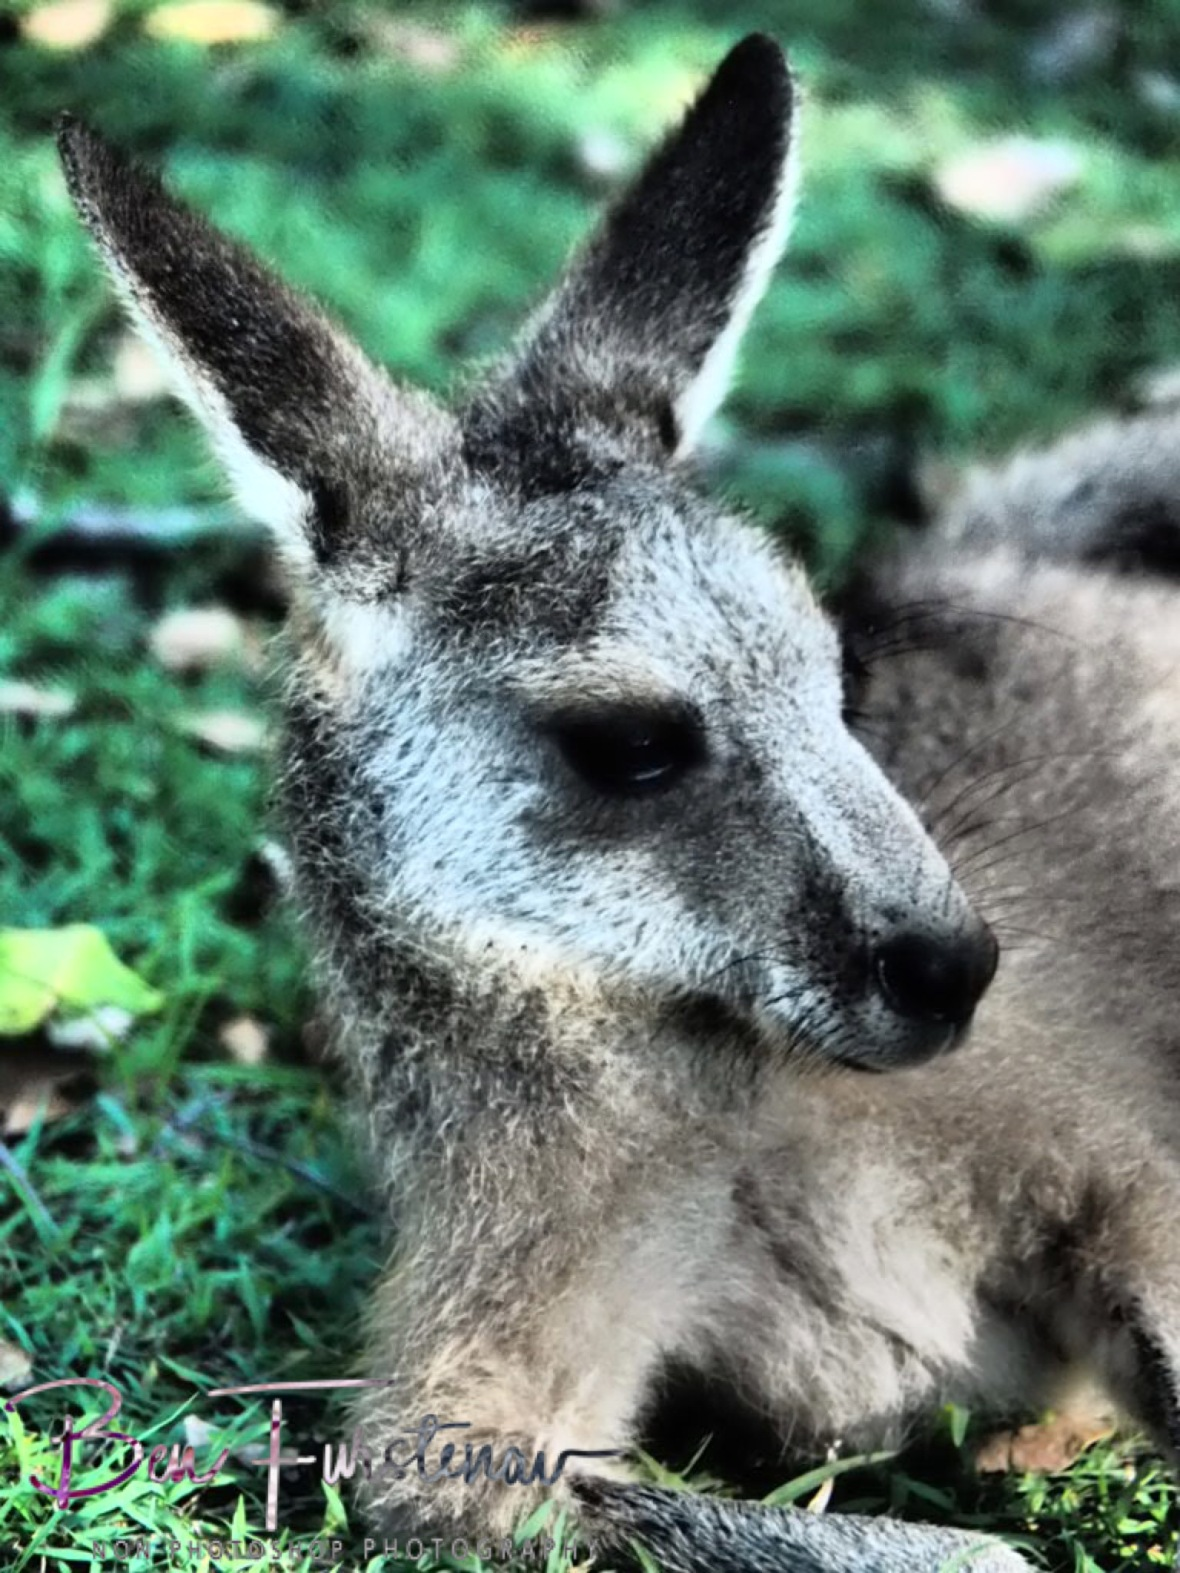 Model look @ Woody Head, Northern New South Wales, Australia